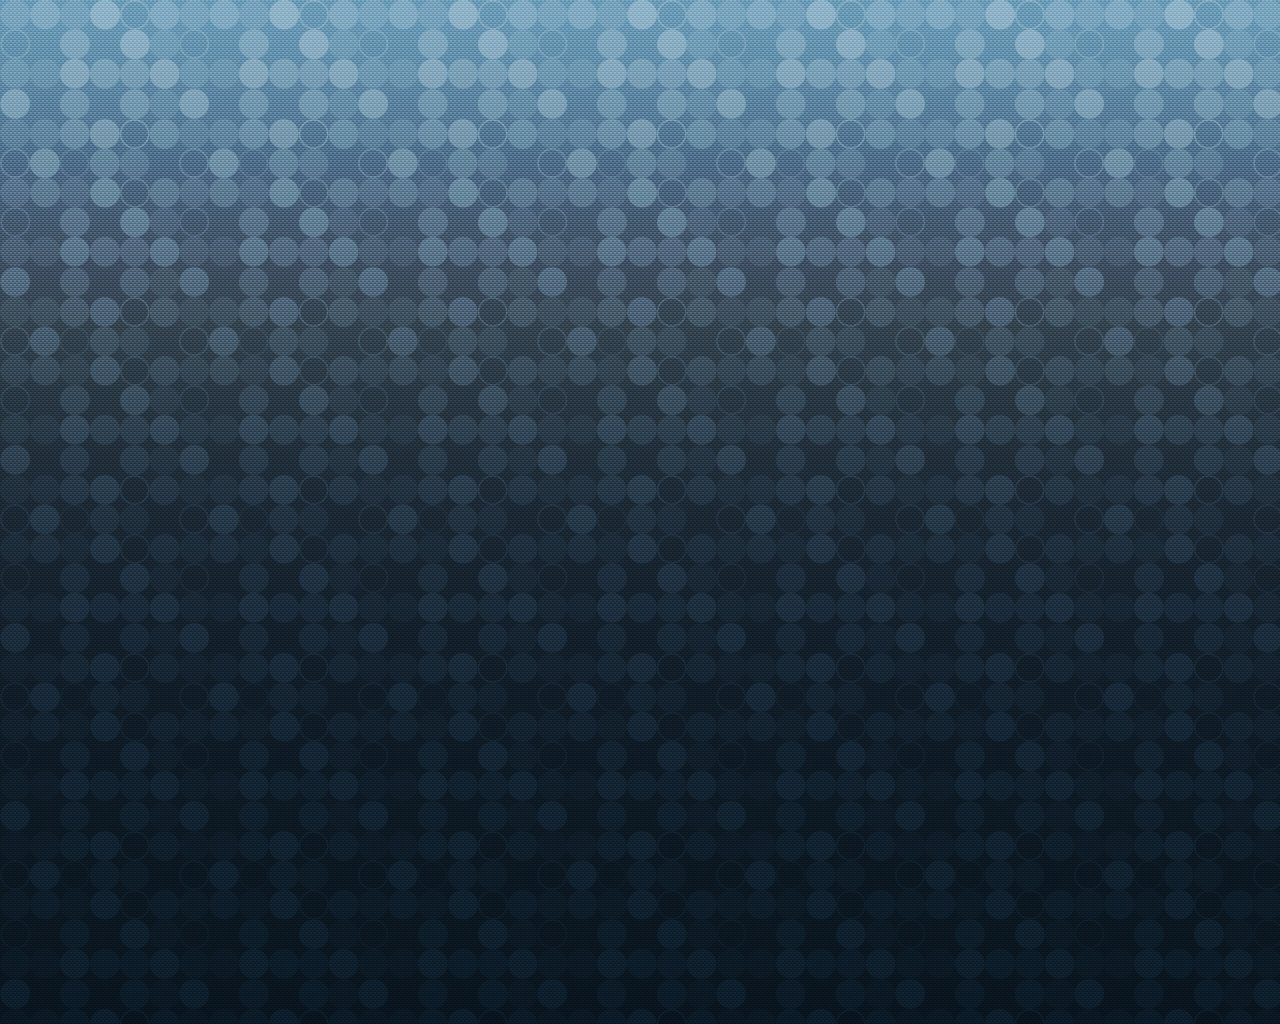 Muster - Andere  Muster Digitale Kunst Abstrakt Wallpaper